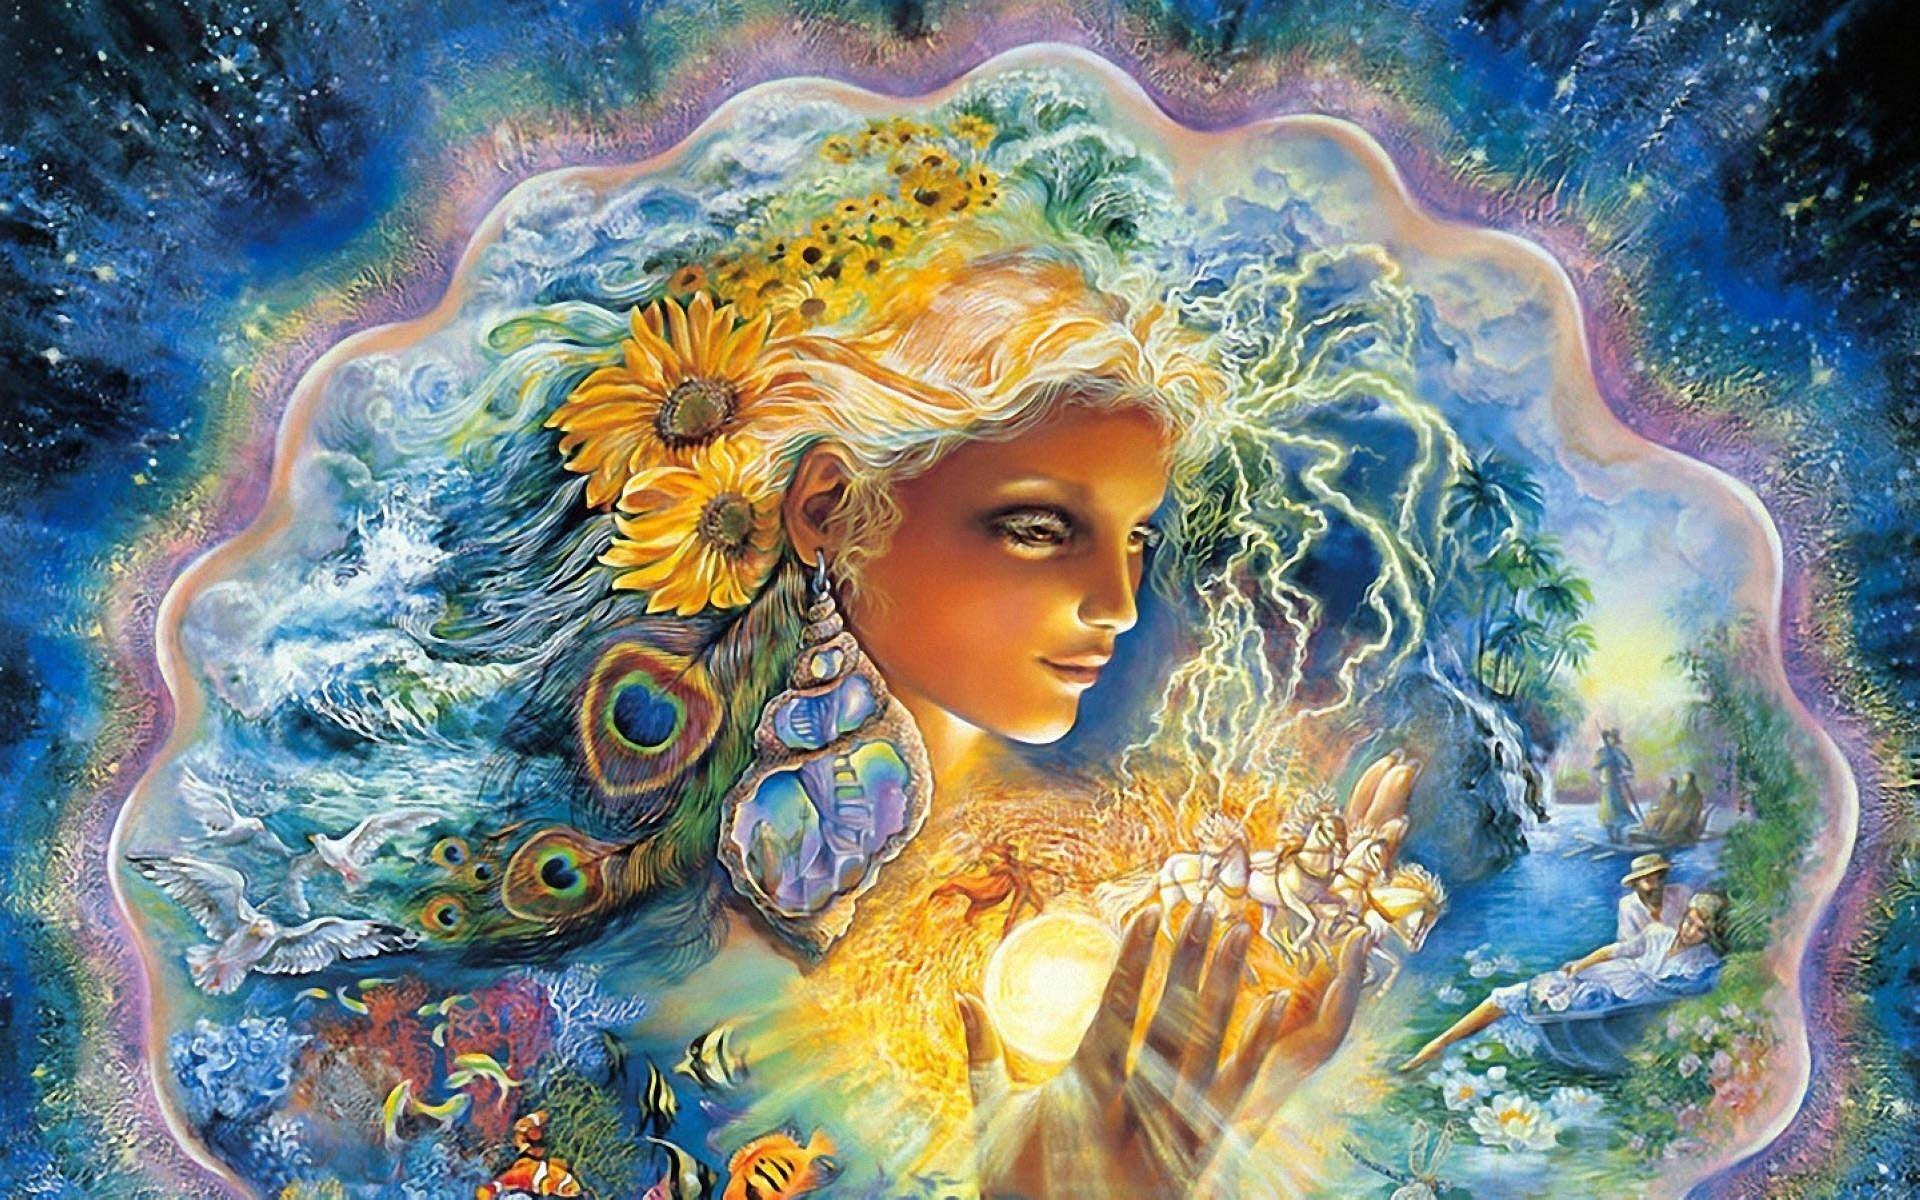 Josephine wall fantasy god goddess artistic face colors ...